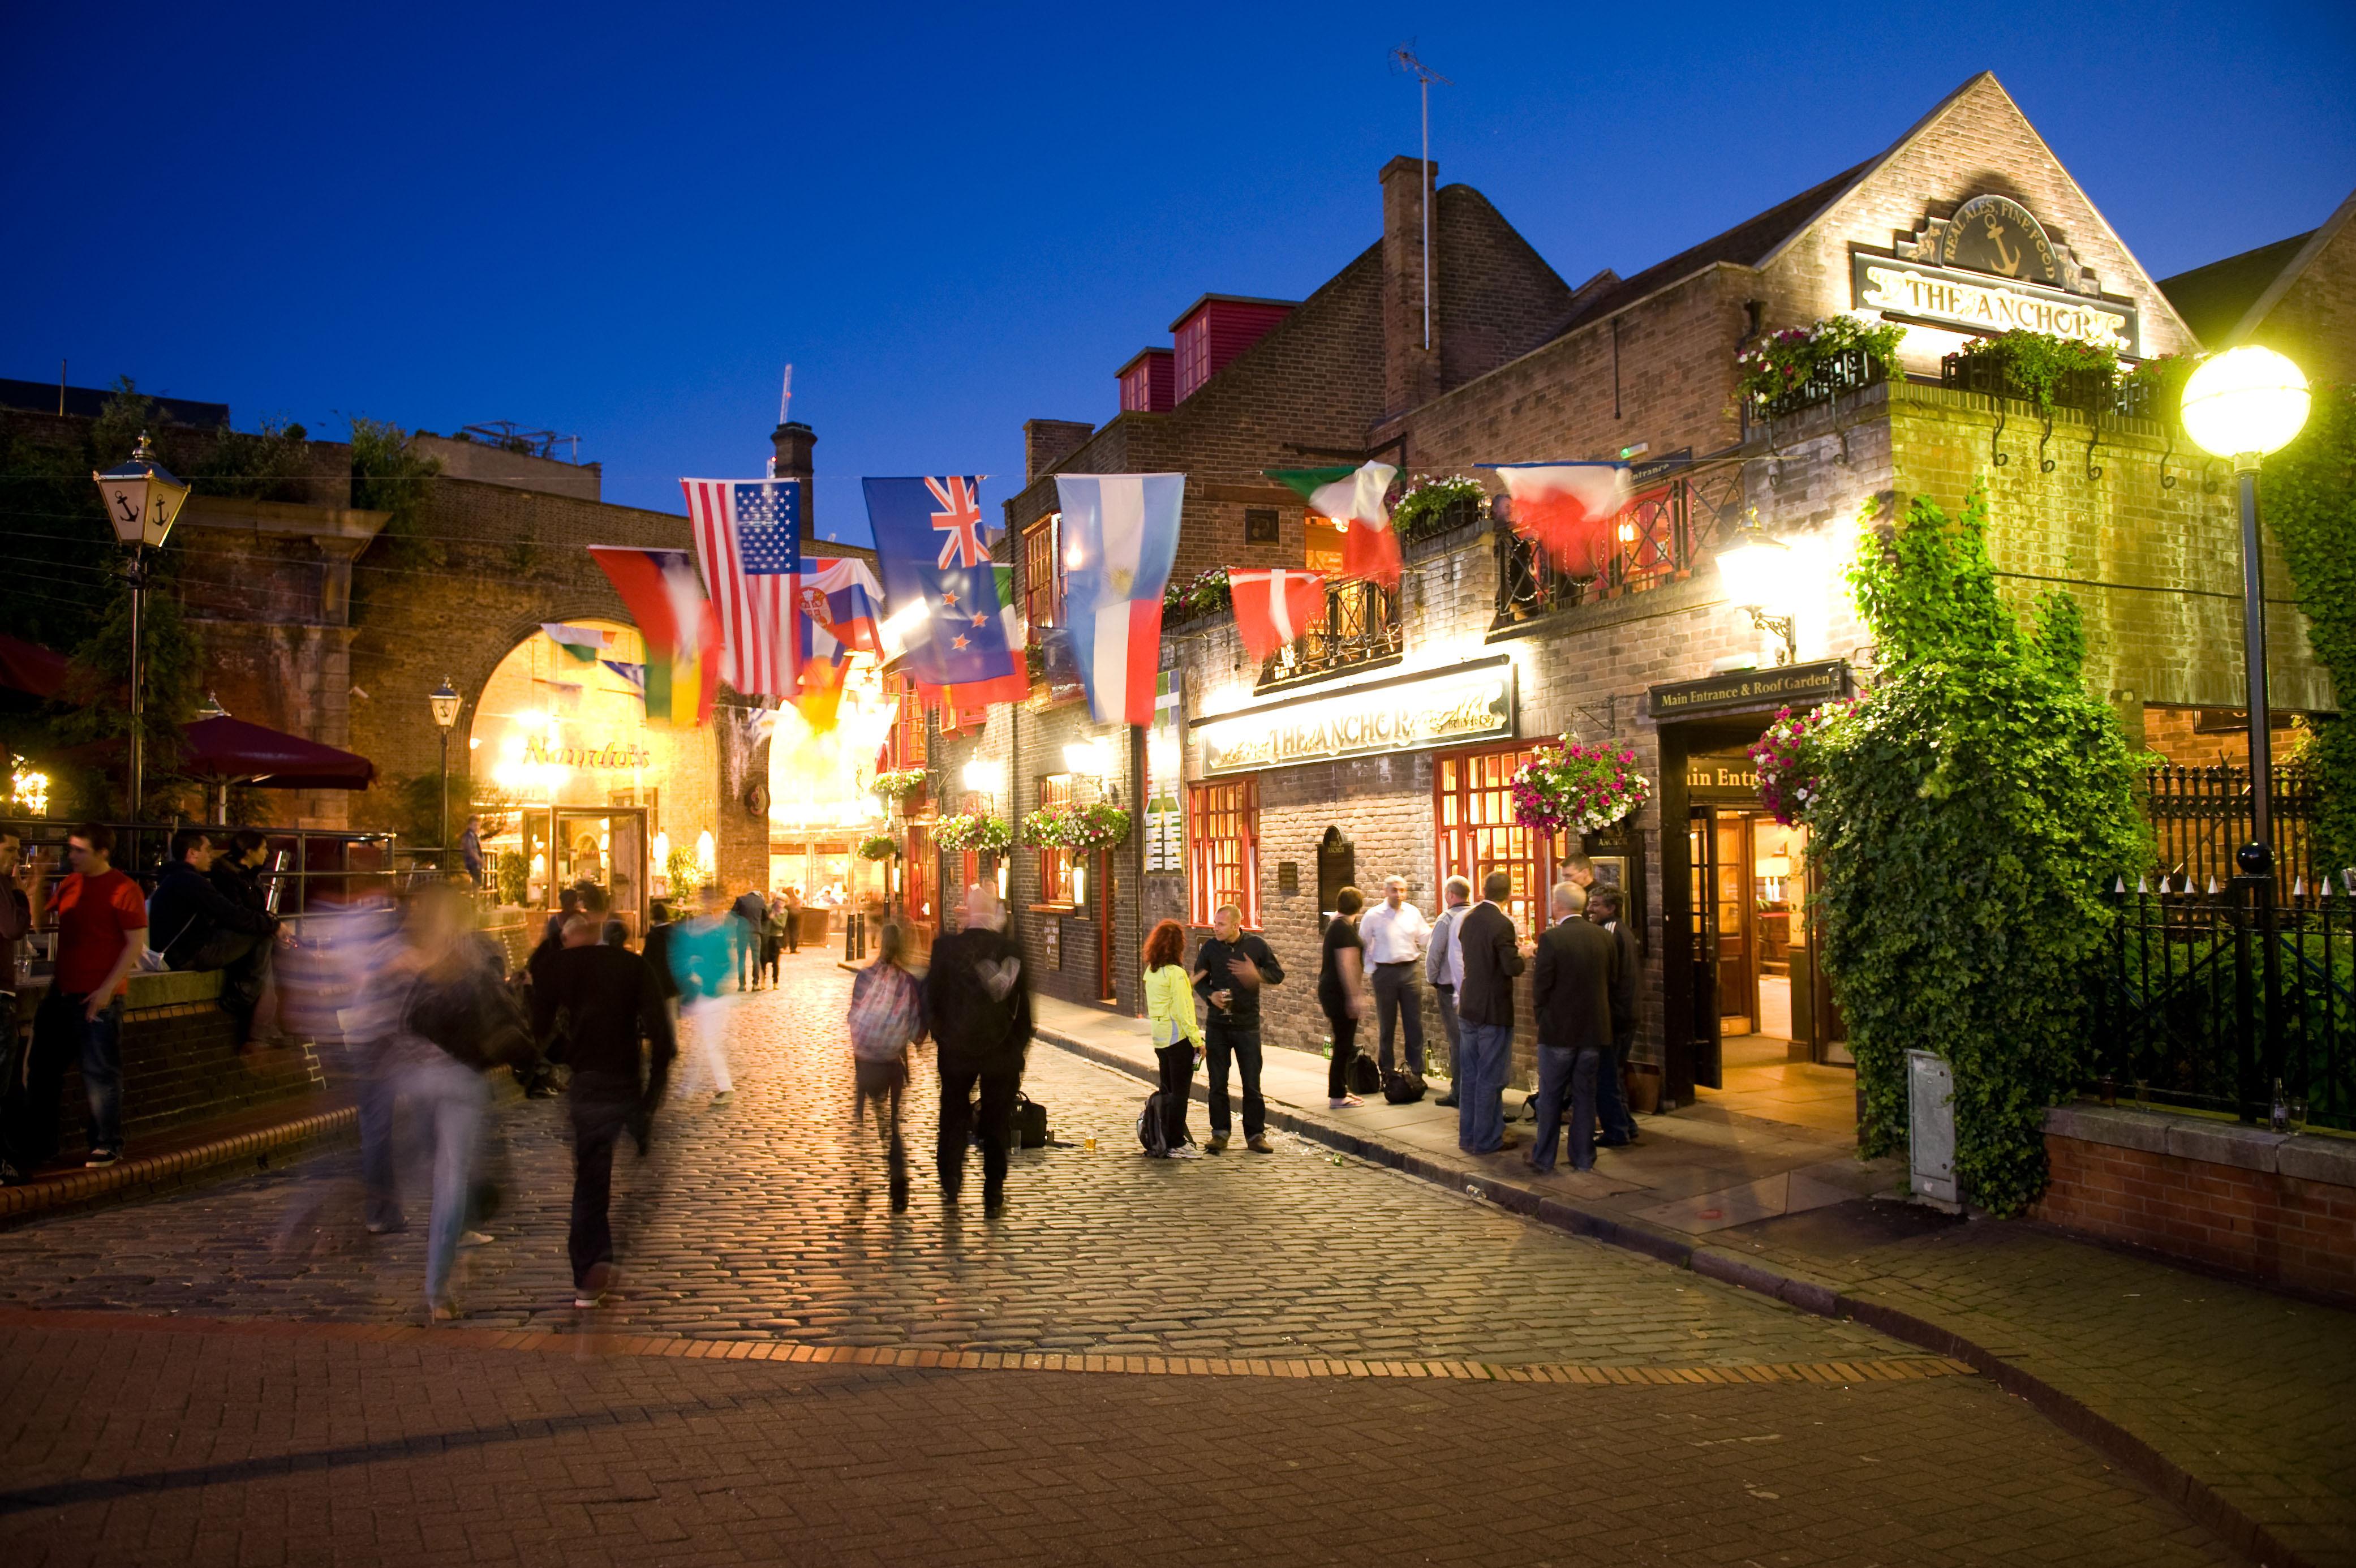 Night lights queens walk london - Reducing Pub Closures